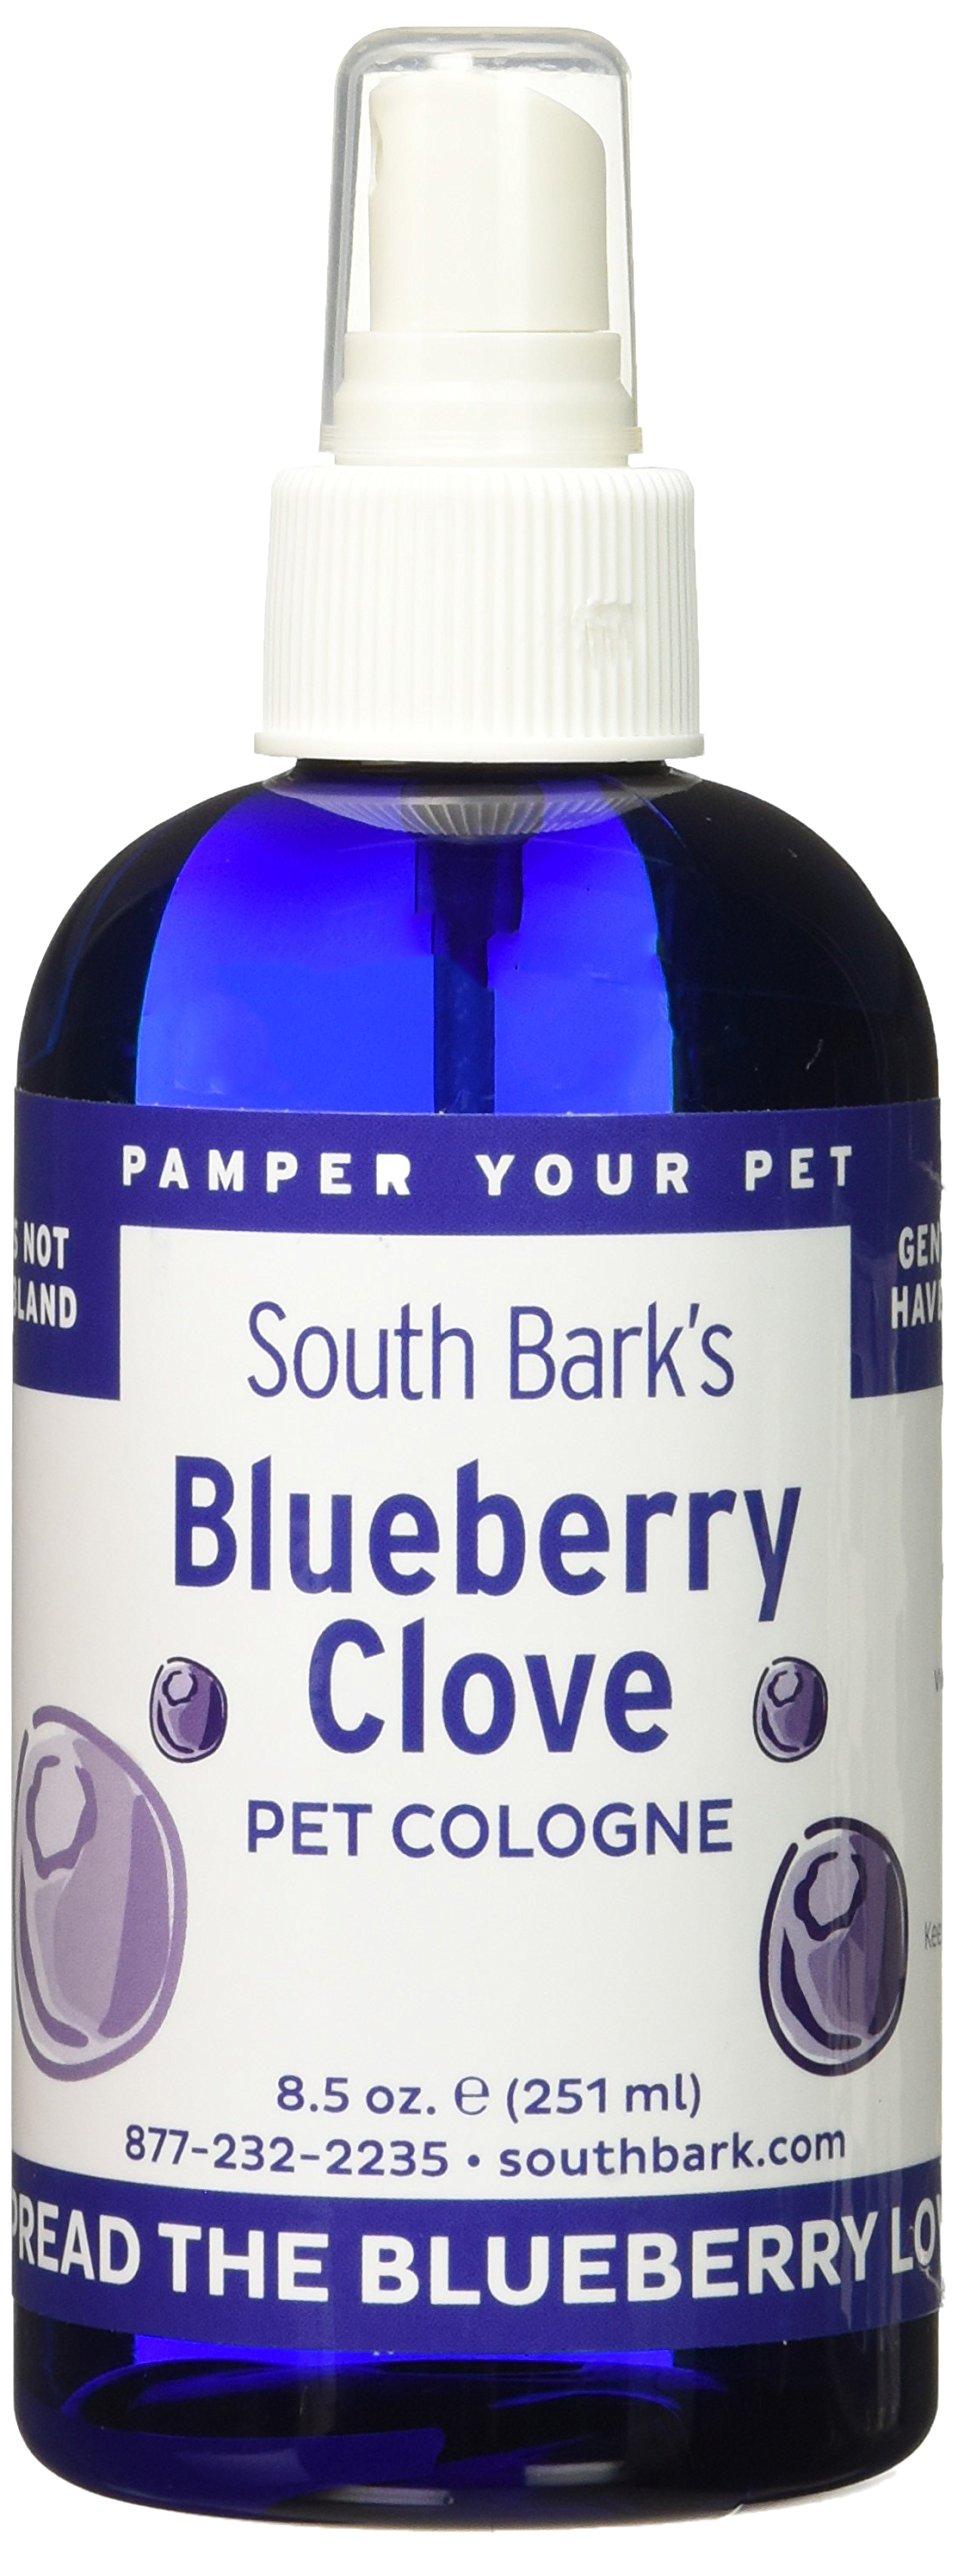 Season Show South Bark's Blueberry Clove Pet Cologne, 8.5 oz